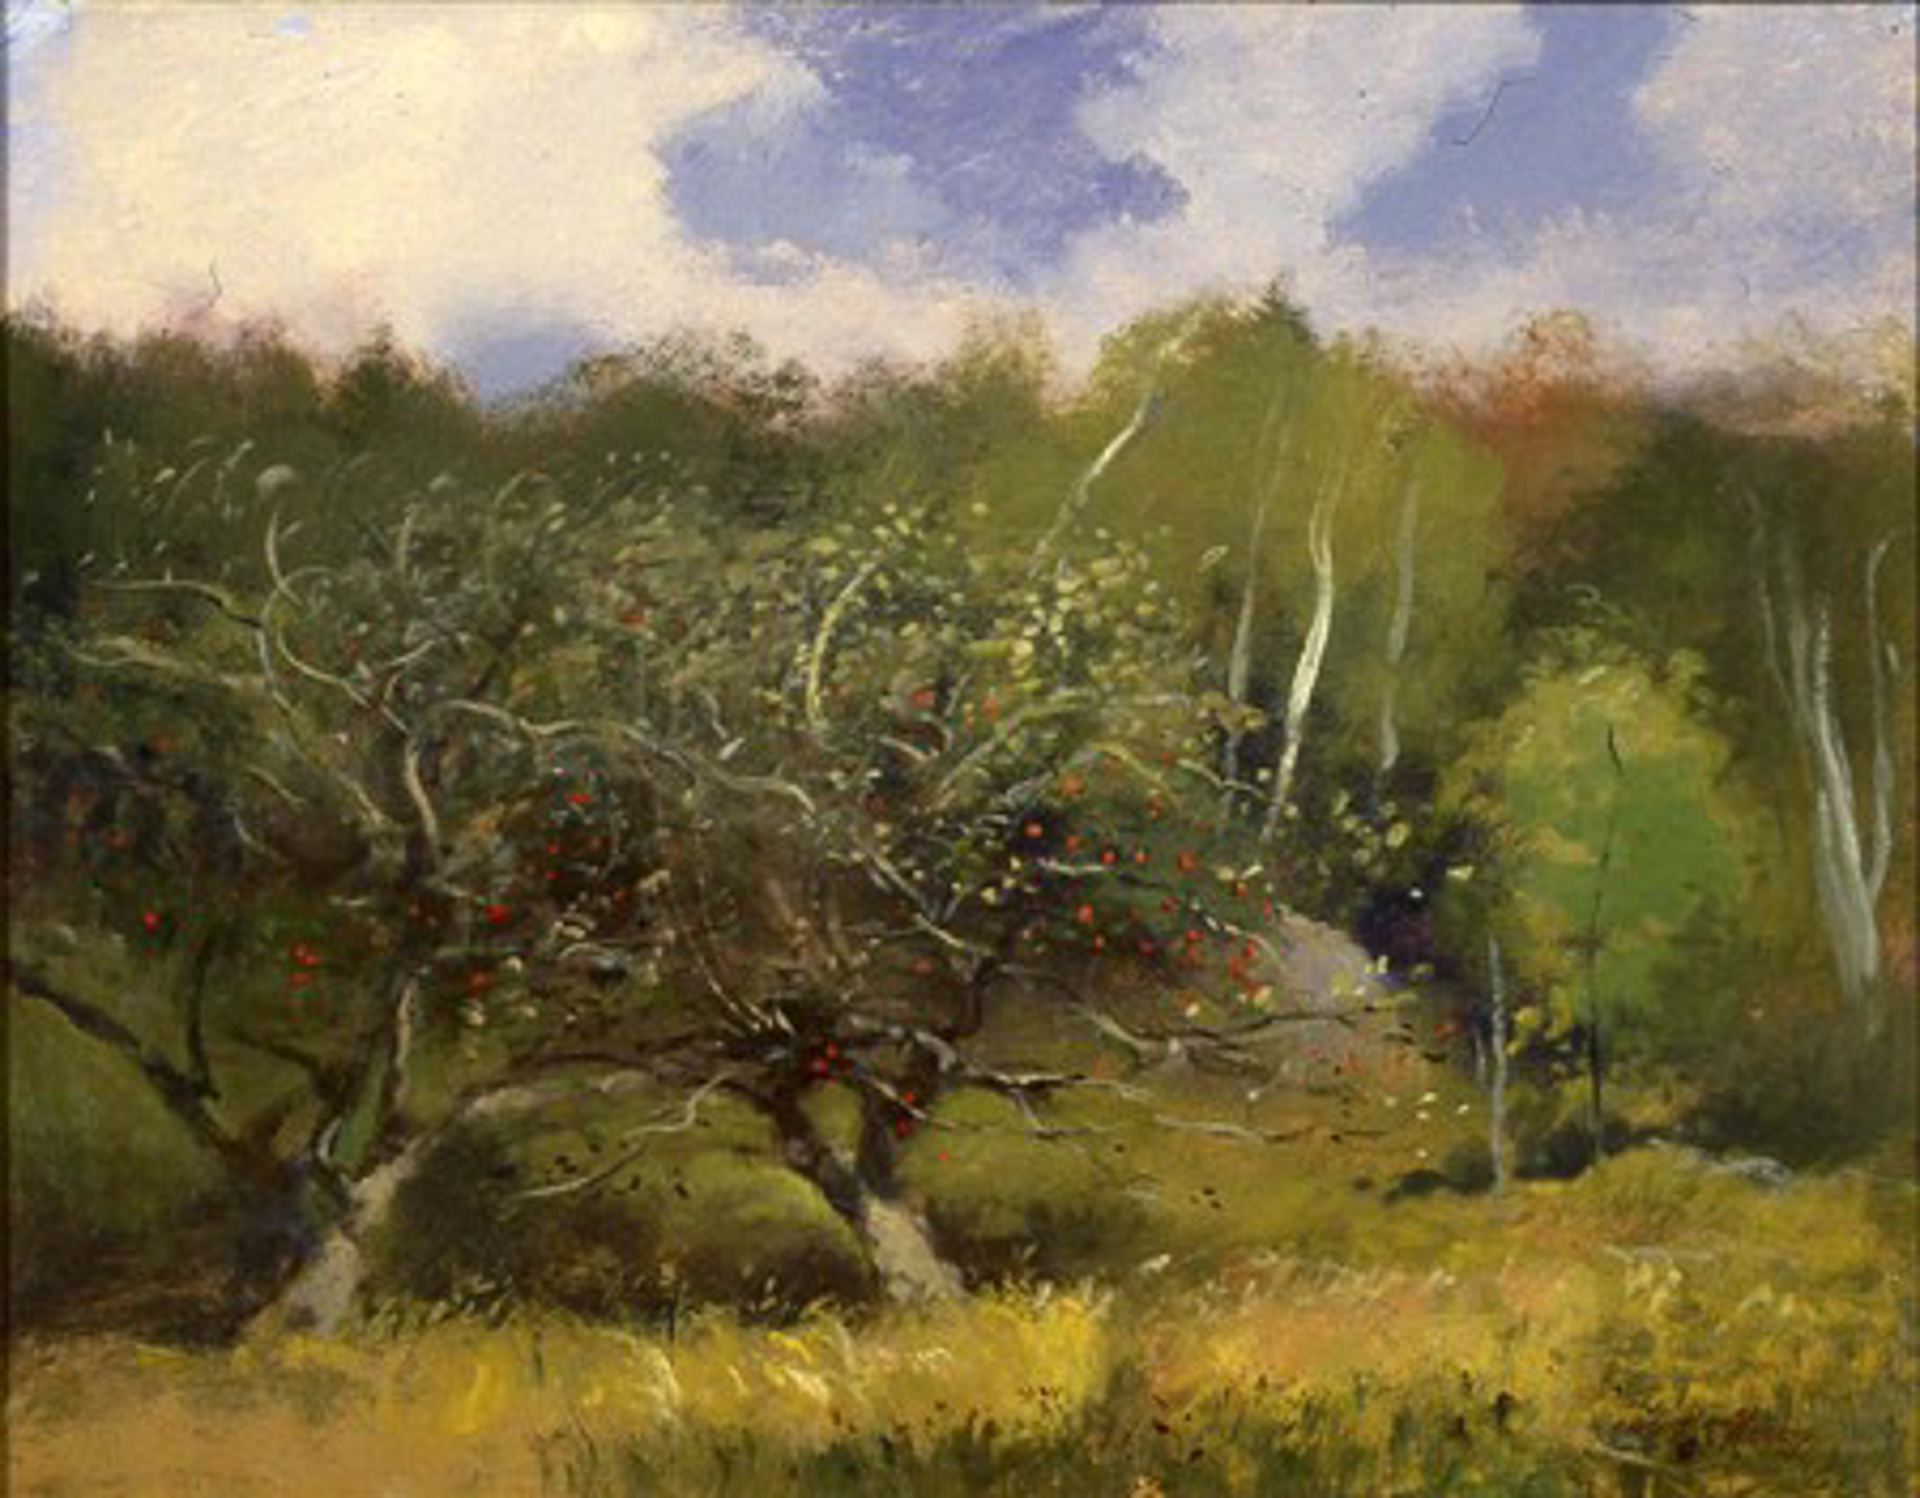 Apple Orchard, Peacham, VT by Frank Mason (1921 - 2009)